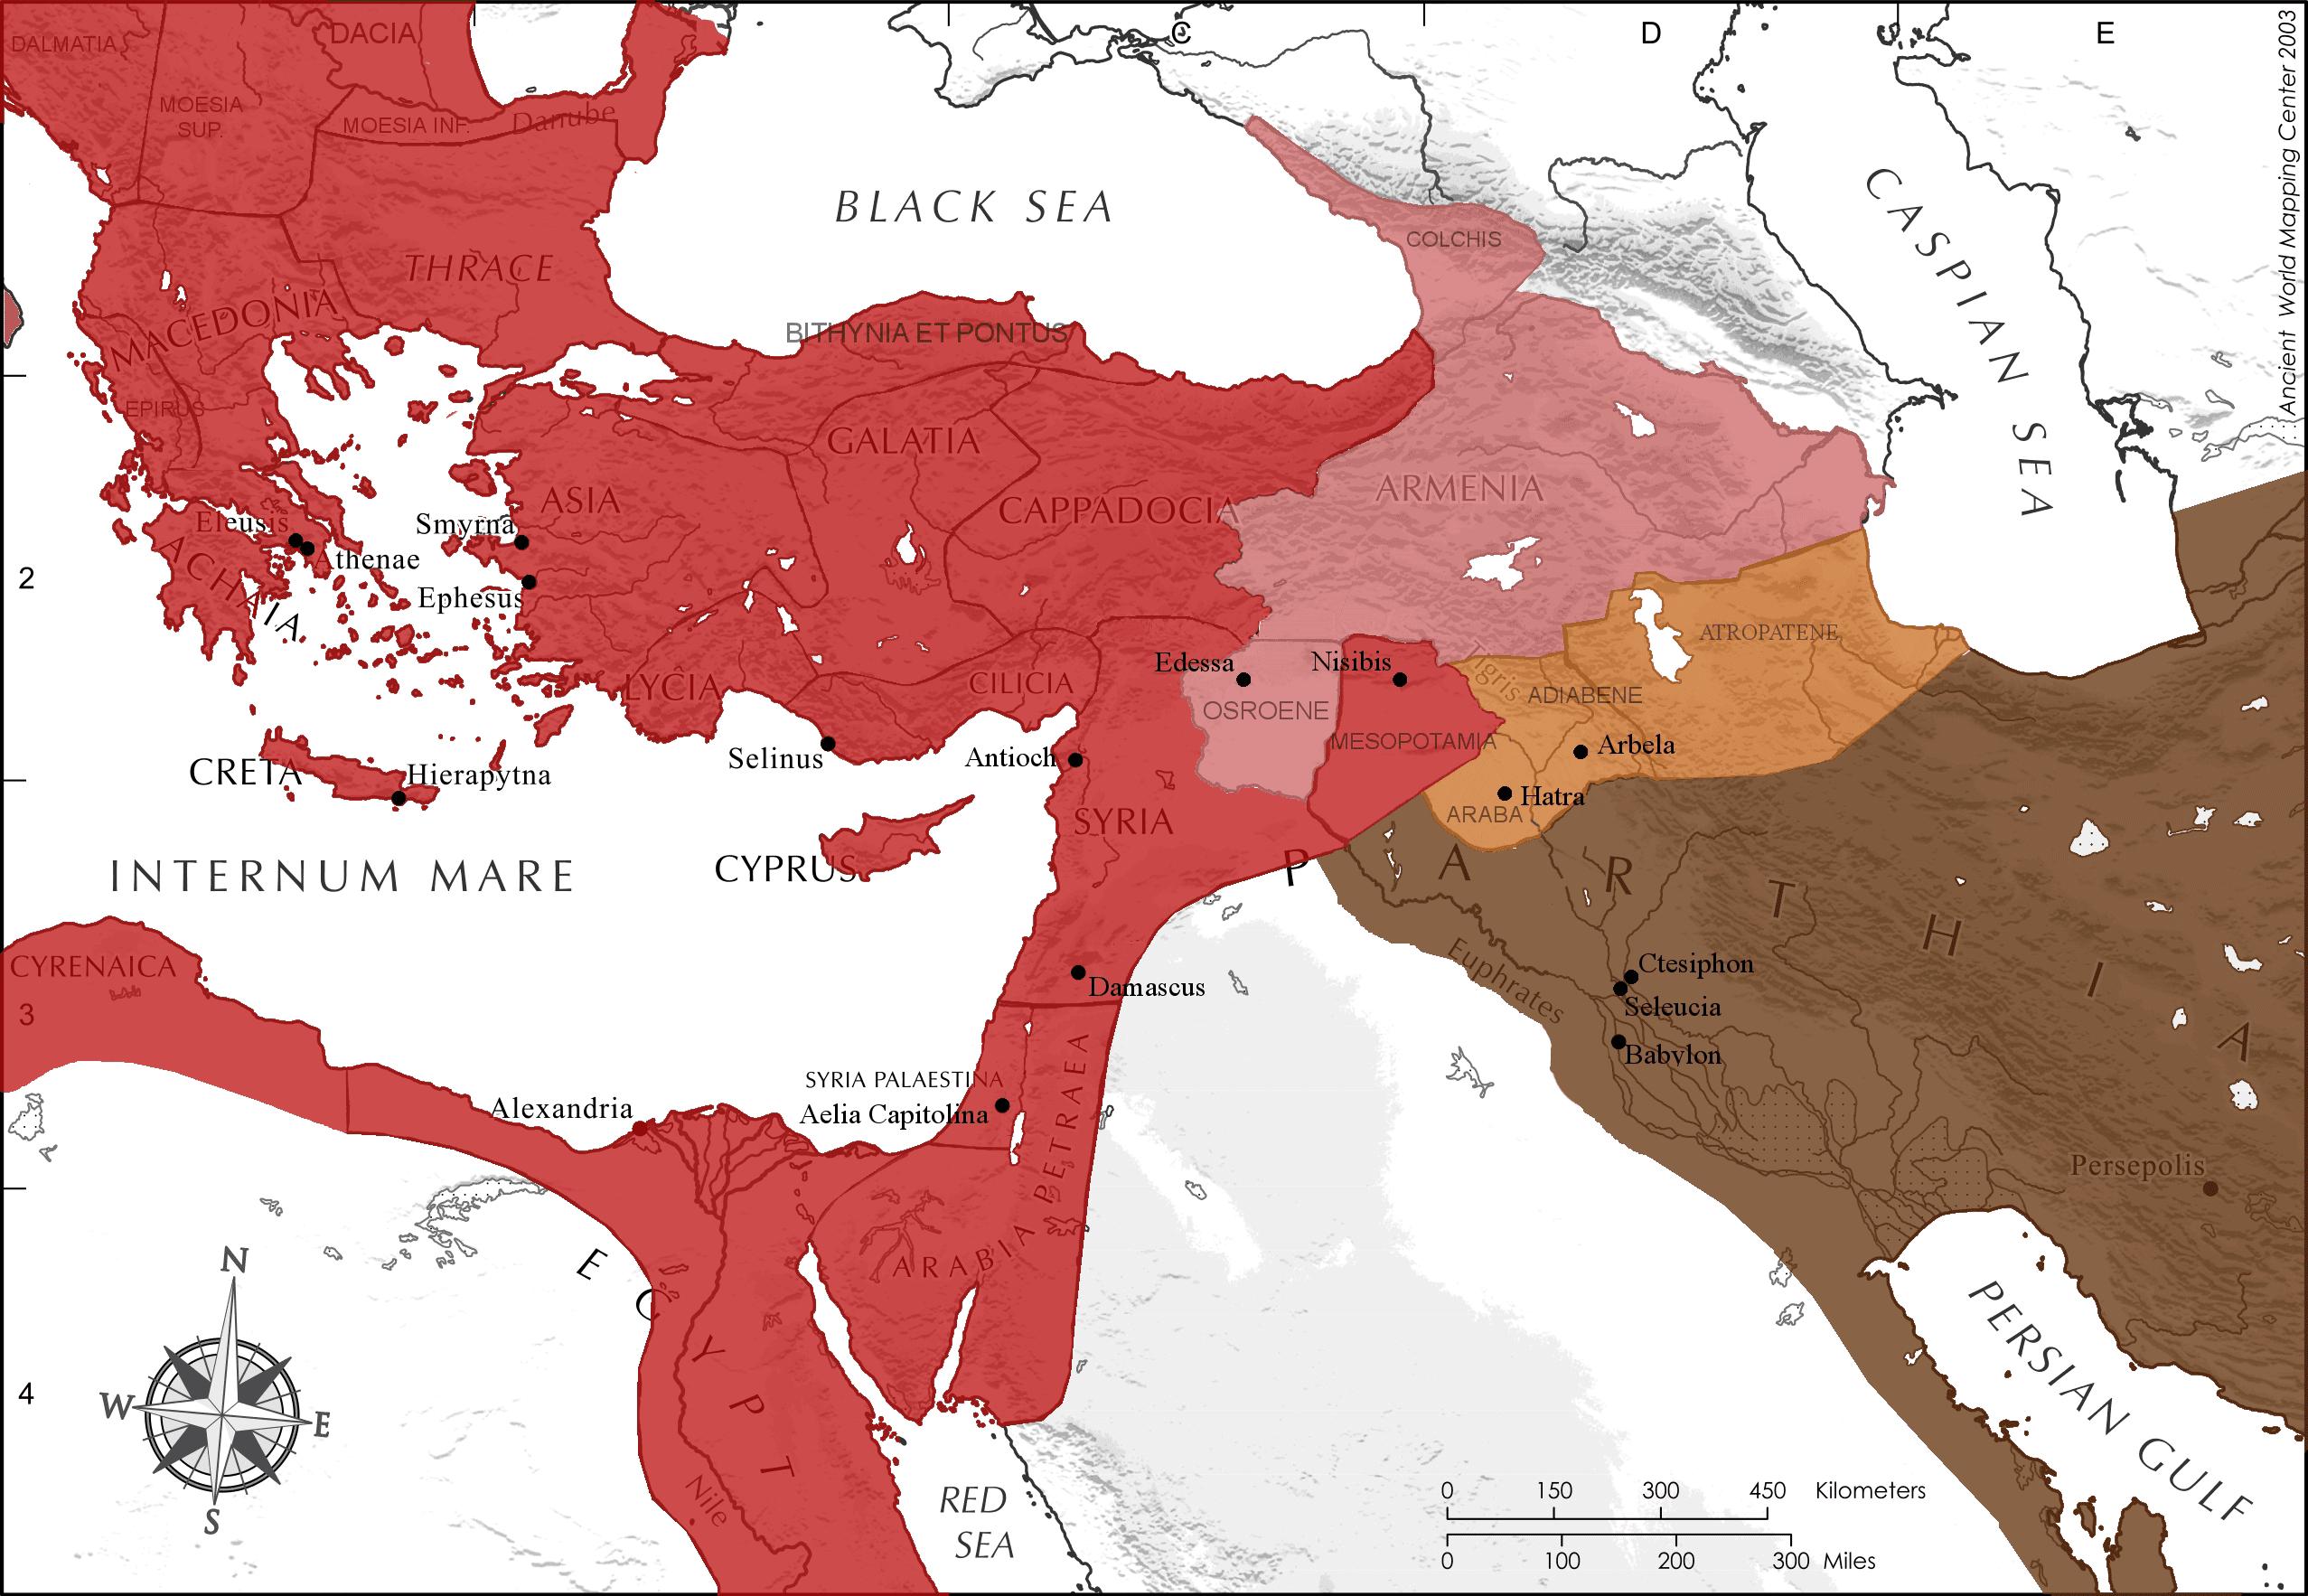 Rzymsko-partyjska granica około roku 200 n.e.